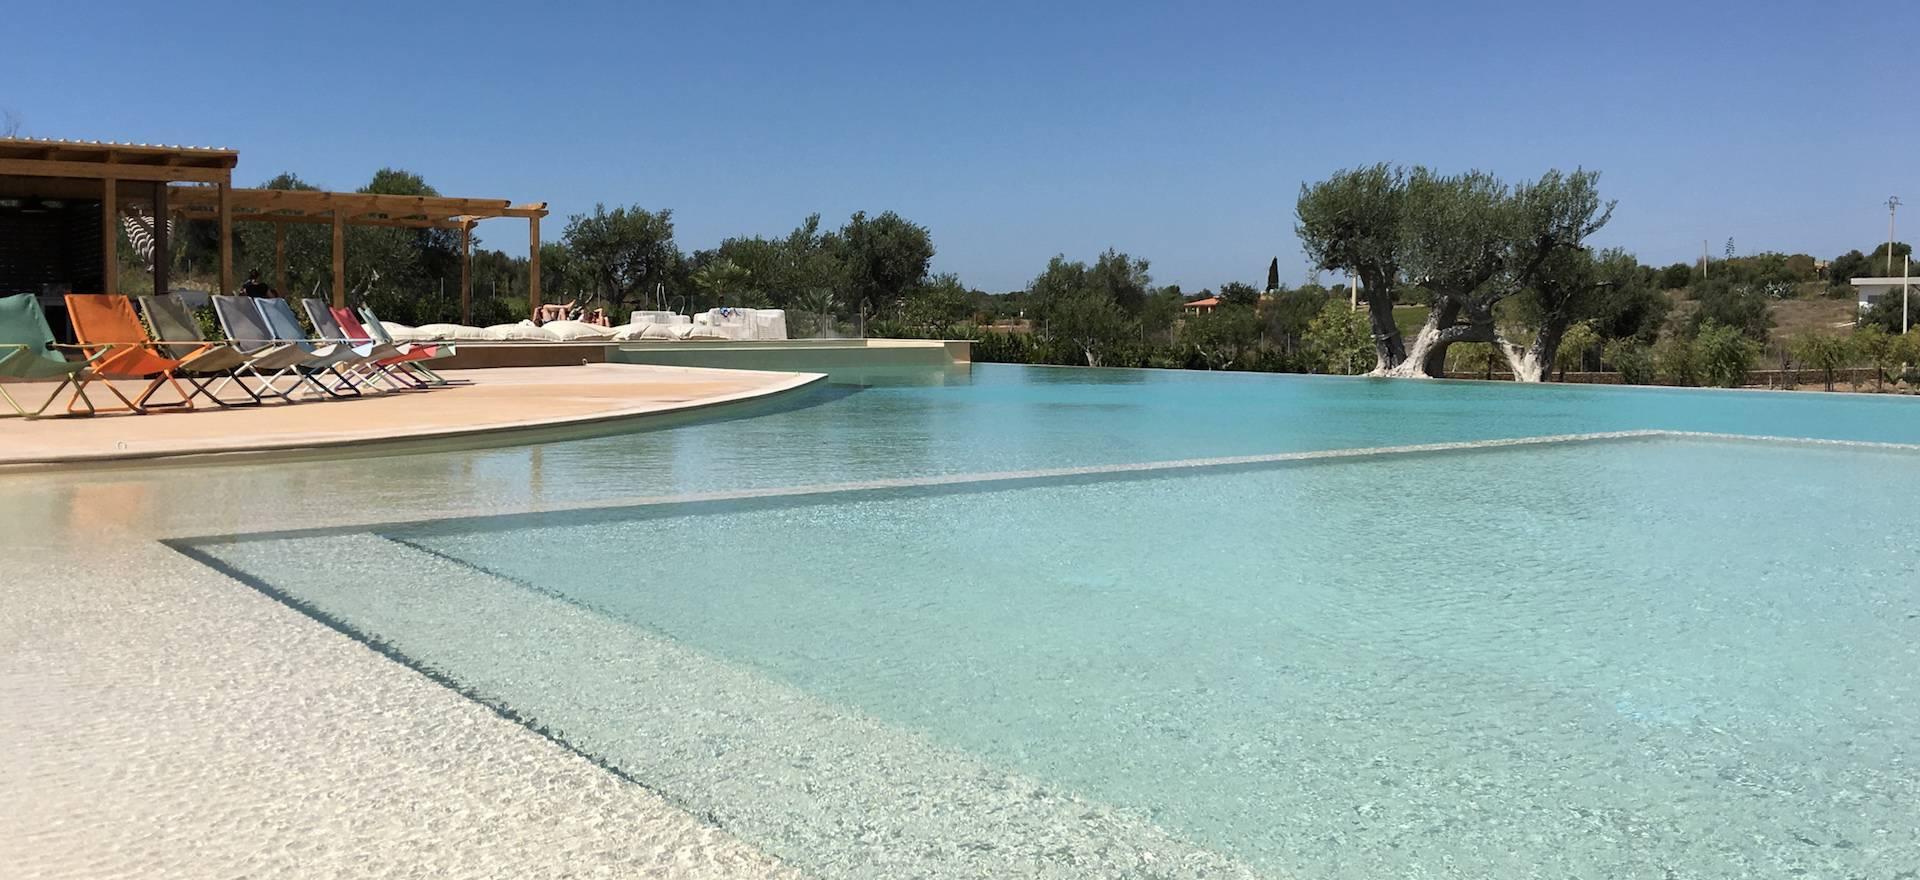 Agriturismo Sicilie Luxe agriturismo voor strandliefhebbers